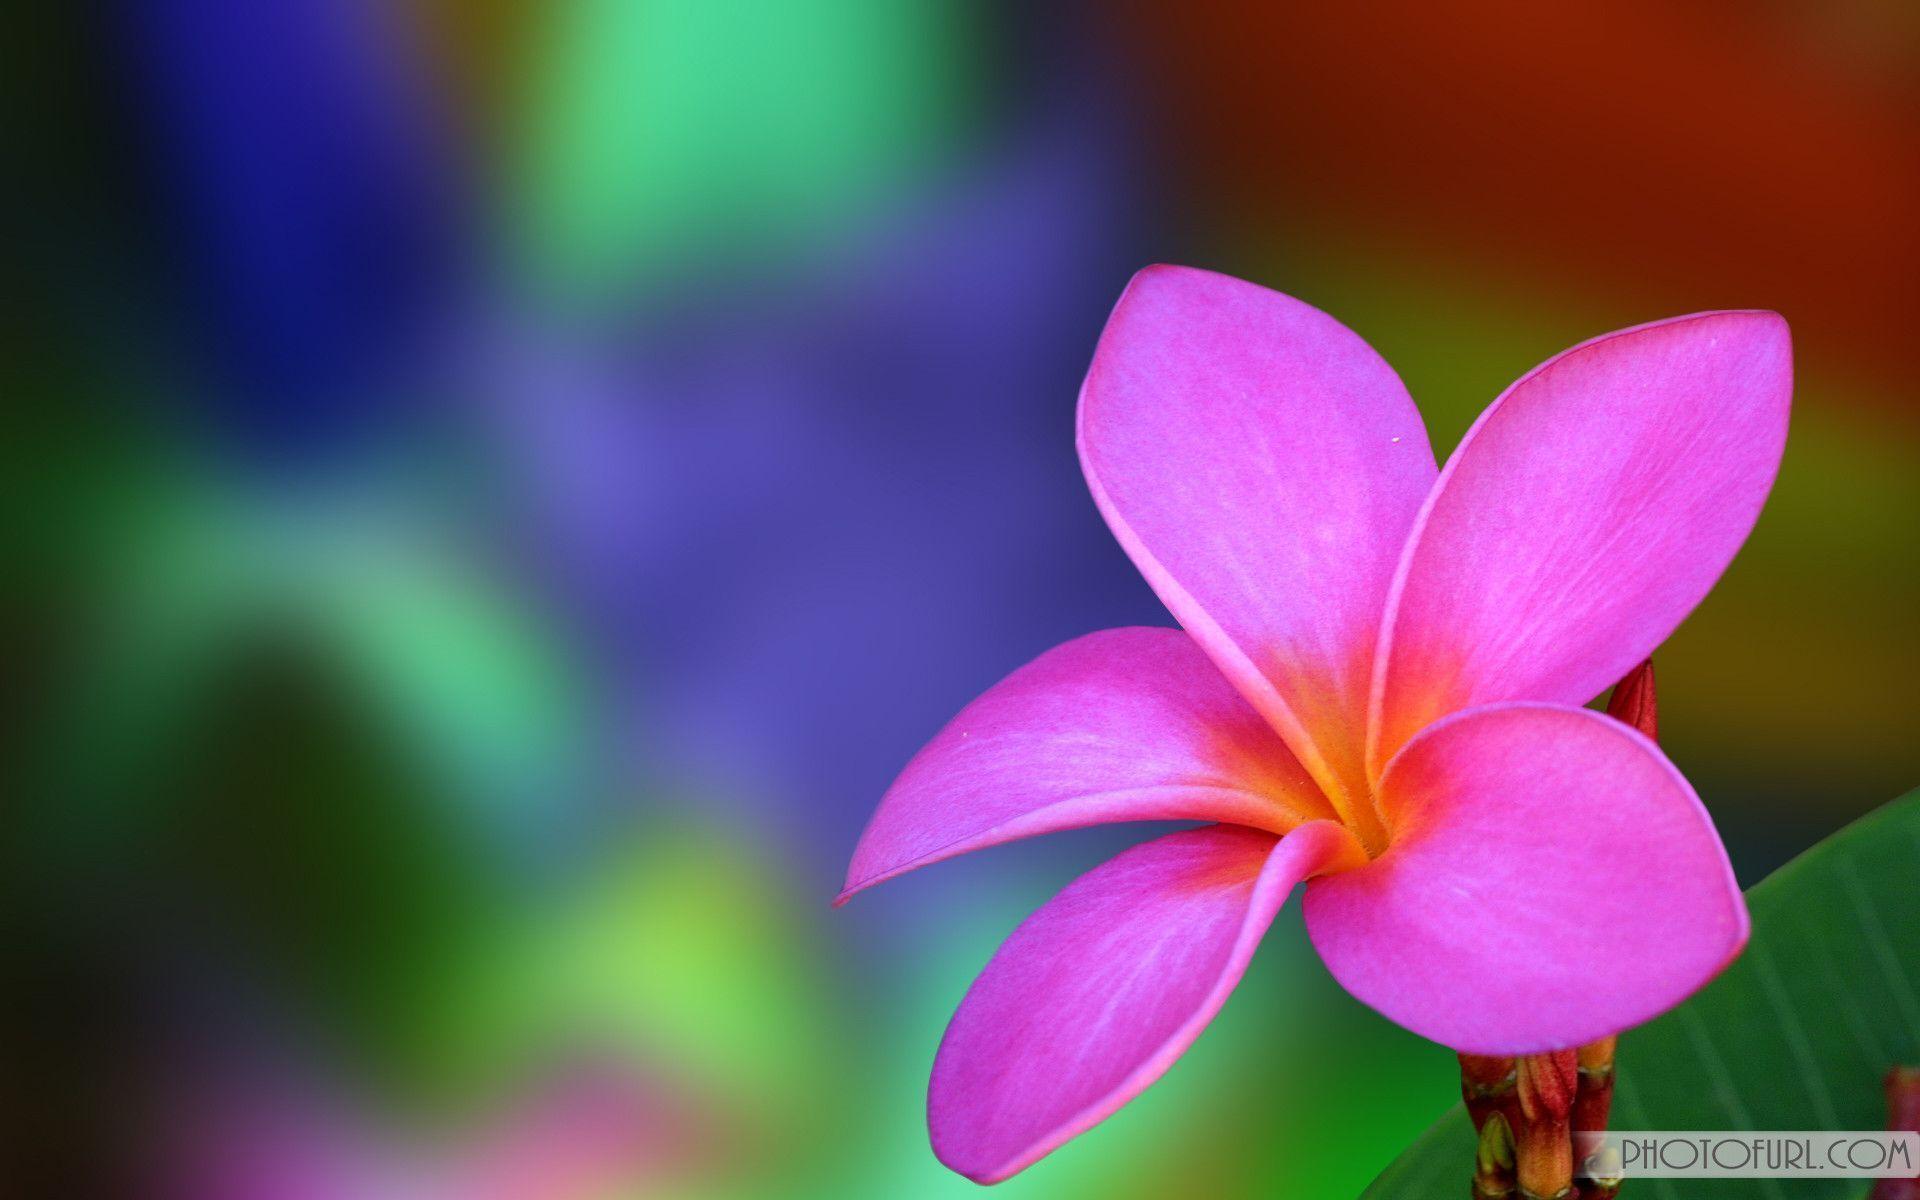 Hd Flower Wallpapers Top Free Hd Flower Backgrounds Wallpaperaccess